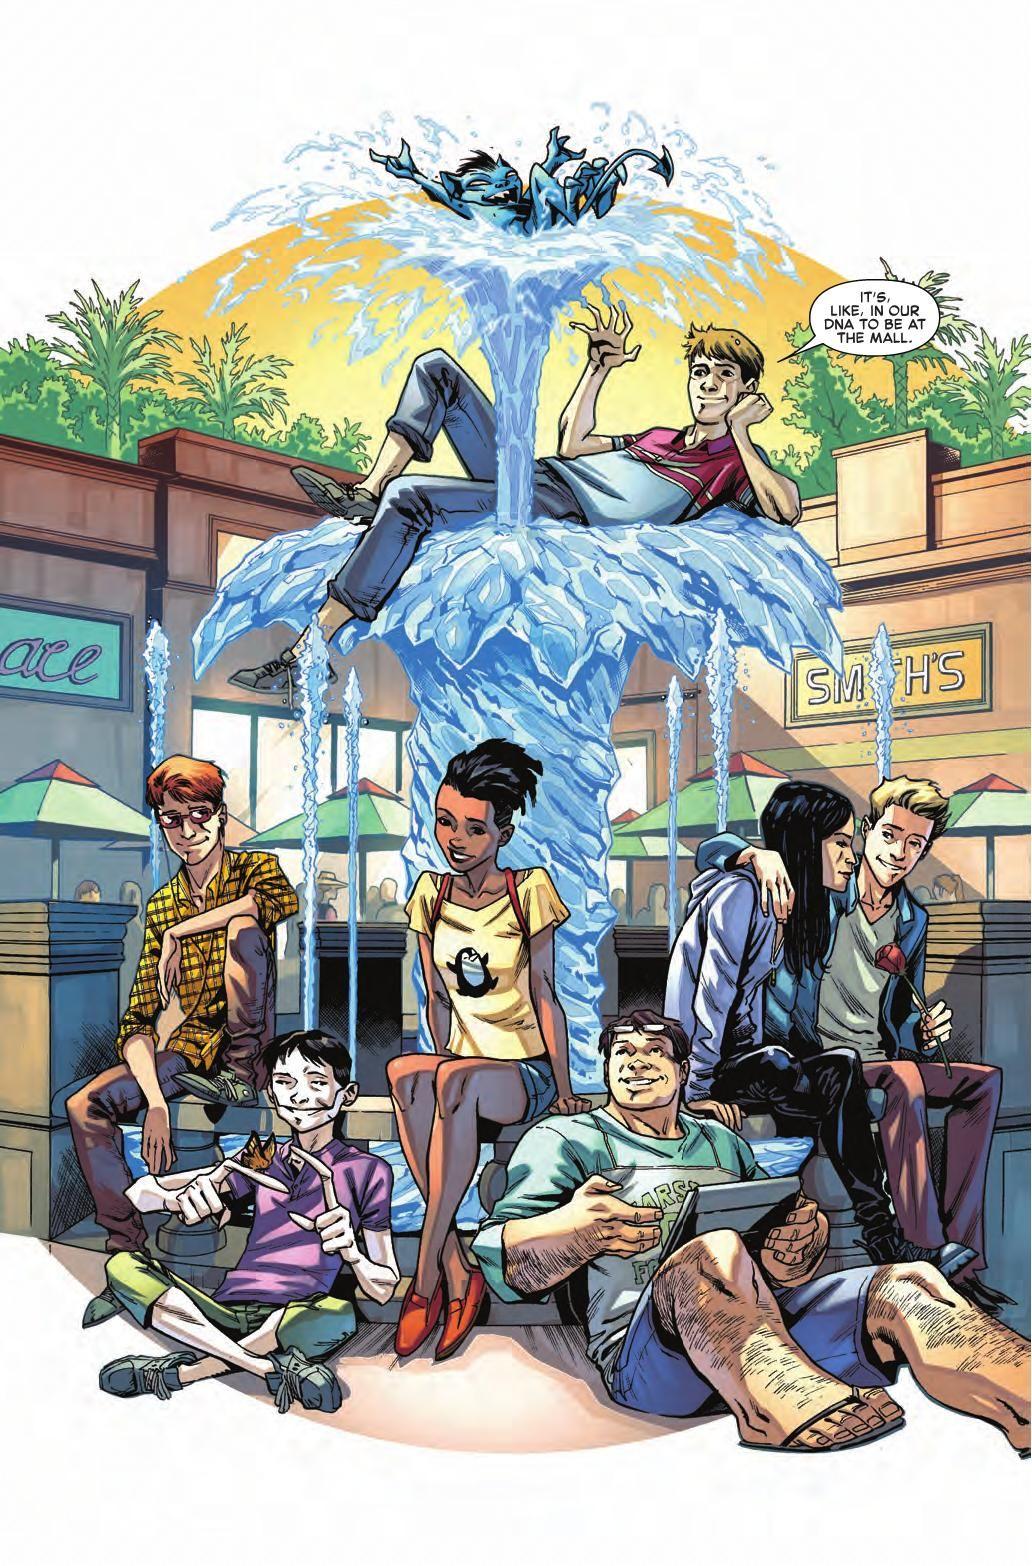 Preview All New X Men Annual 1 Story Sina Grace Rex Ogle Art Cory Smith Cover Cory Smith Publisher Marvel Publication Date N Comics X Men Xmen Comics